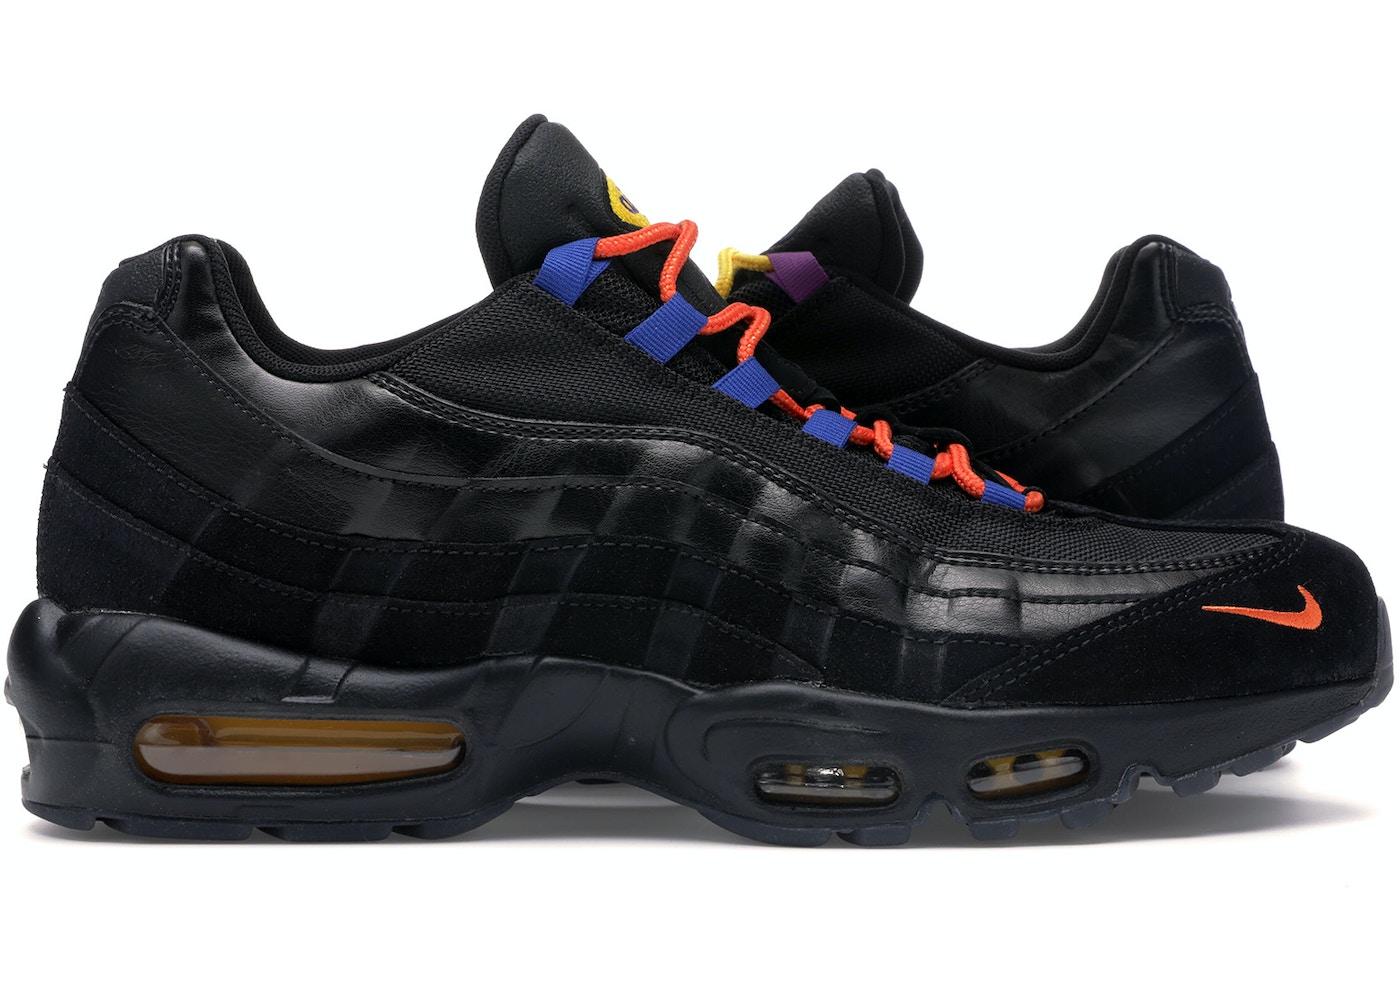 wholesale dealer b2458 e9646 Buy Nike Air Max 95 Shoes & Deadstock Sneakers